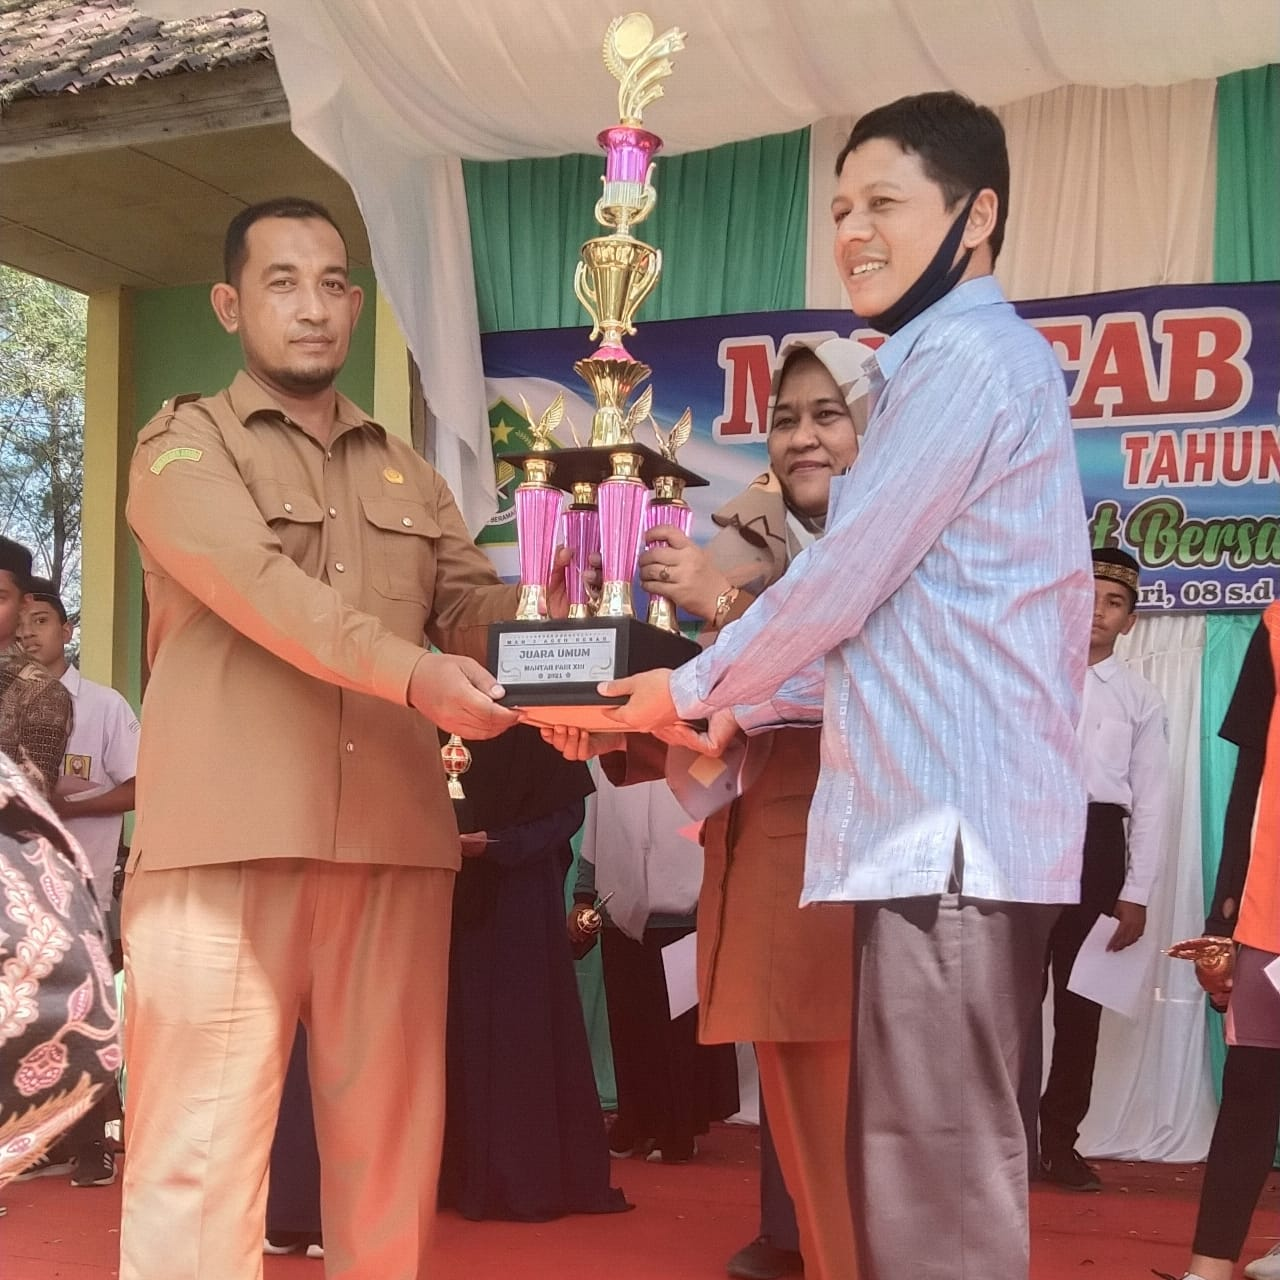 Mtsn Indrapuri Juara Umum Mantab Fair 2021 Man 3 Aceh Besar Lamuri Online